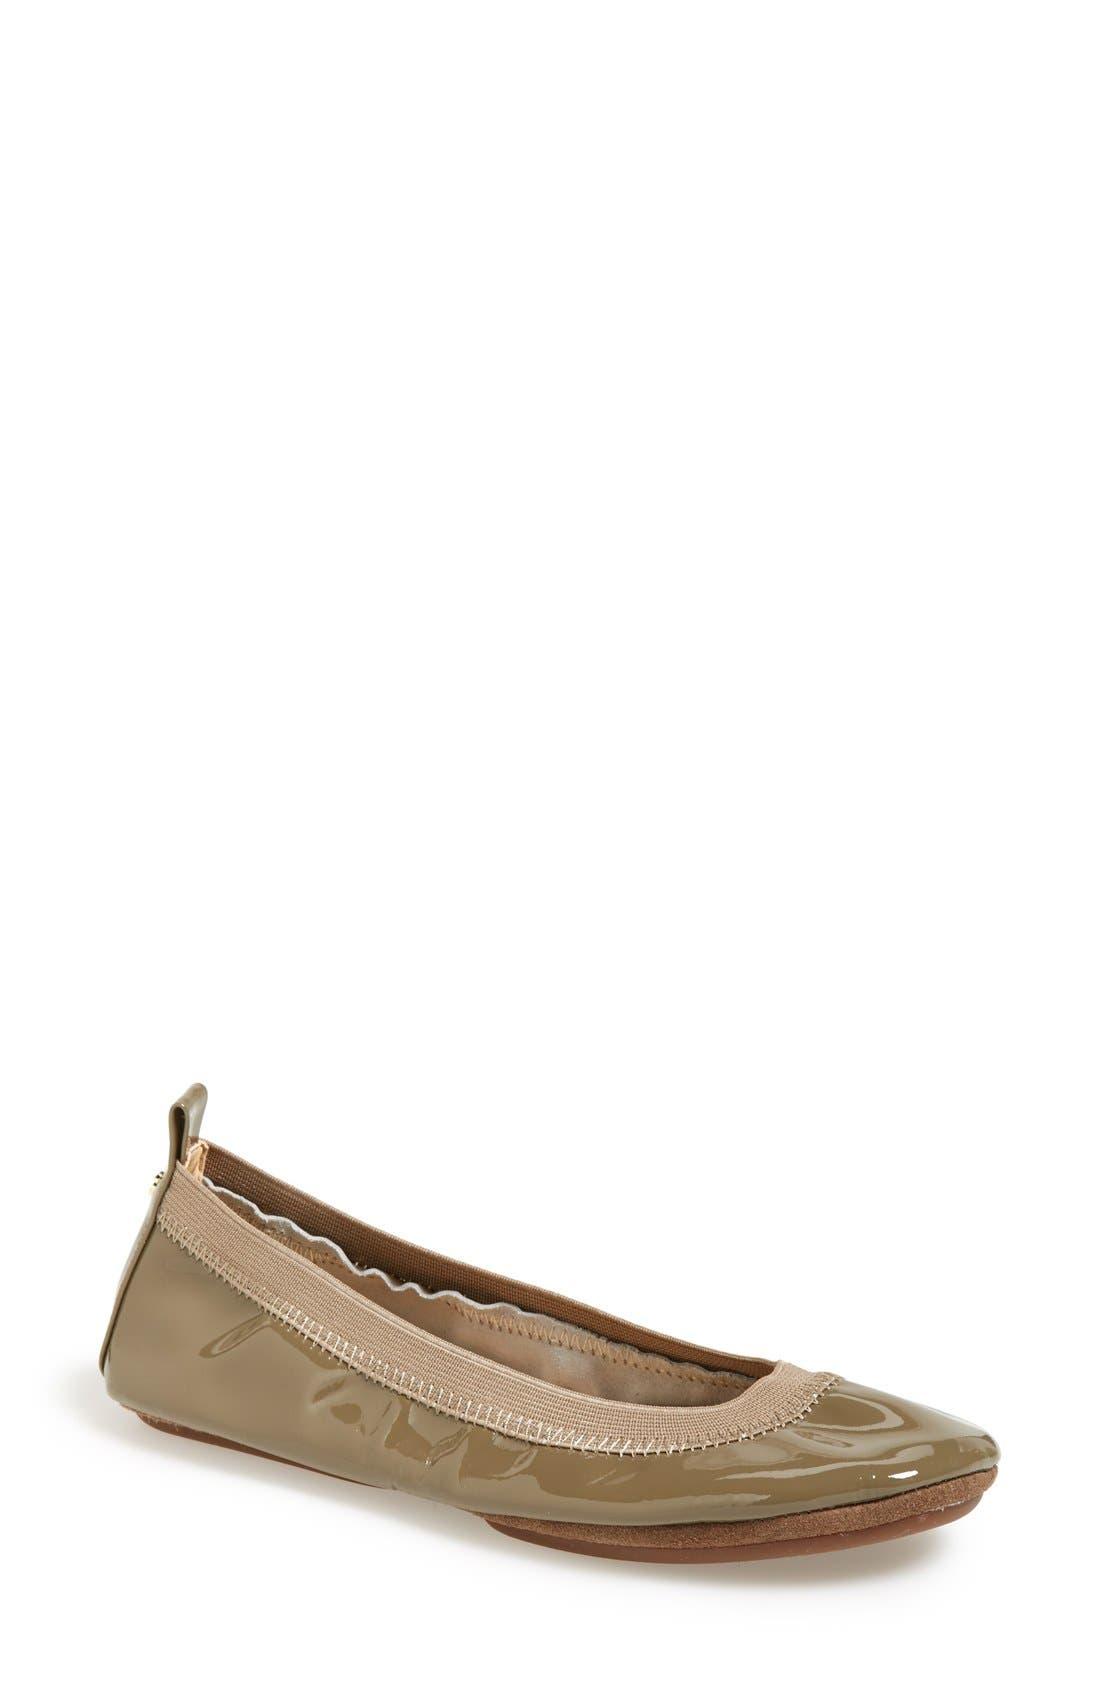 Yosi Samra 'Samara' Patent Leather Foldable Ballet Flat (Women)